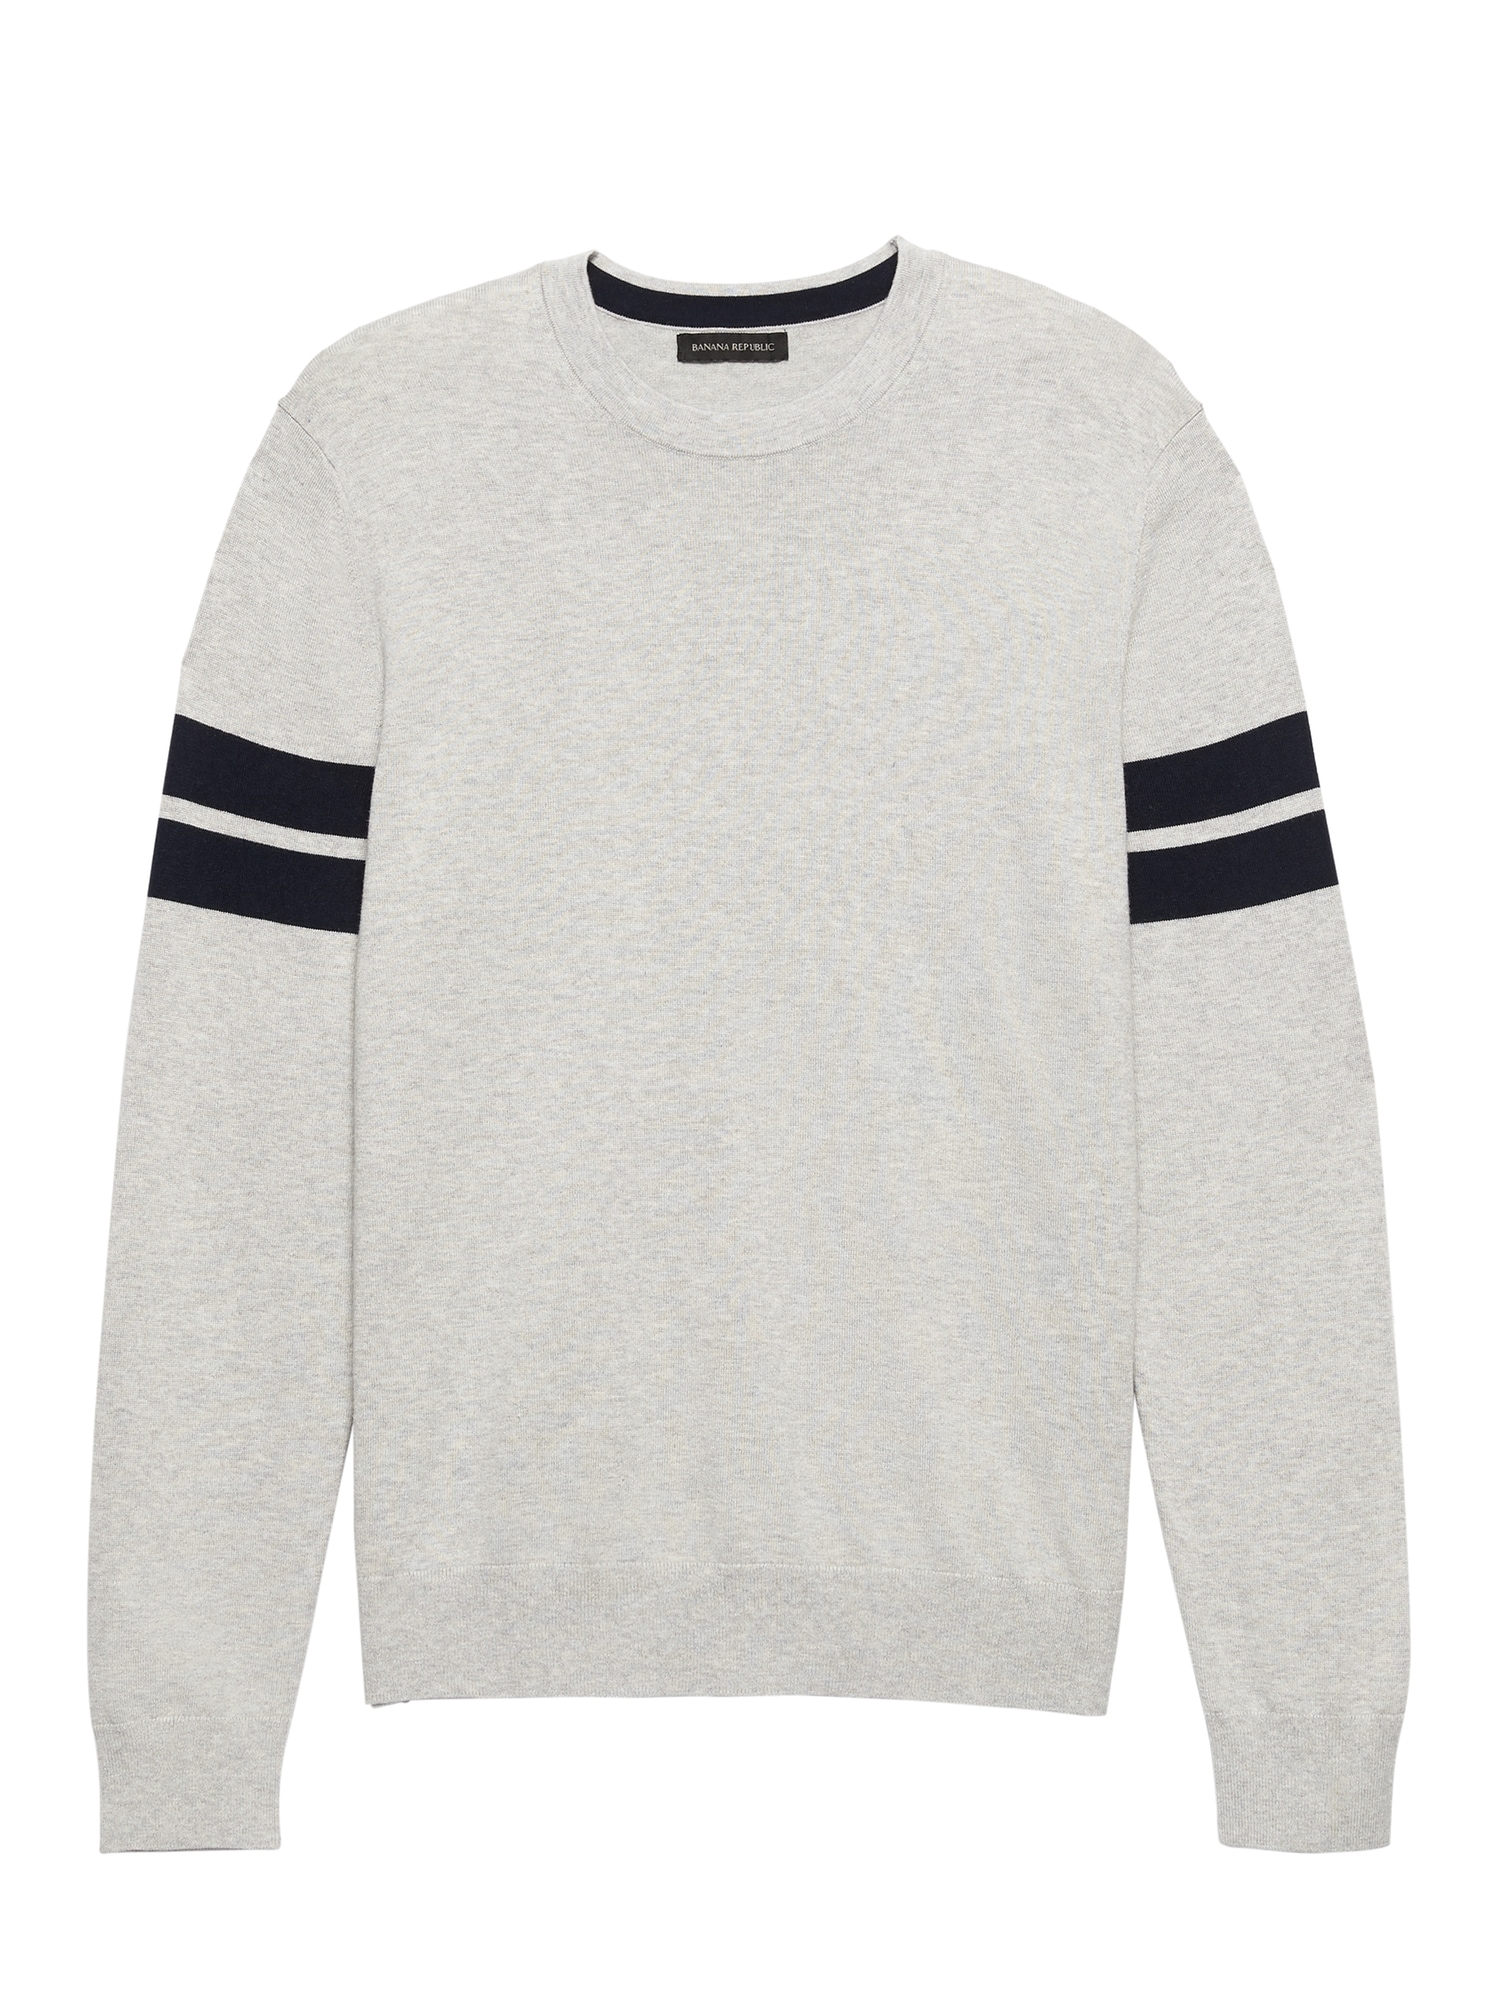 a1e239815323df Silk Cotton Cashmere Varsity Sweater